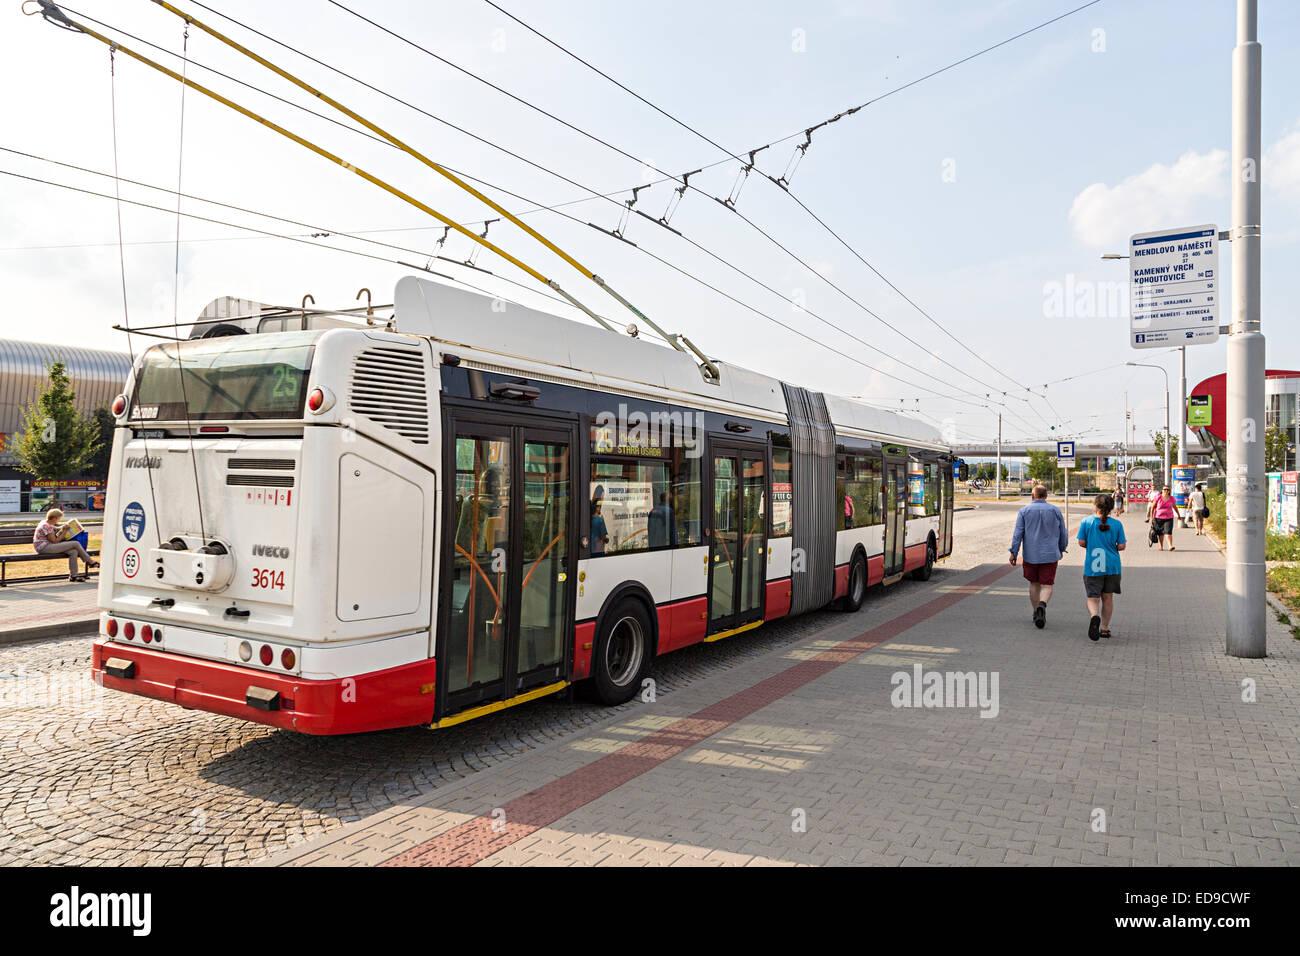 Public transport bus at bus stop, Brno, Czech Republic - Stock Image